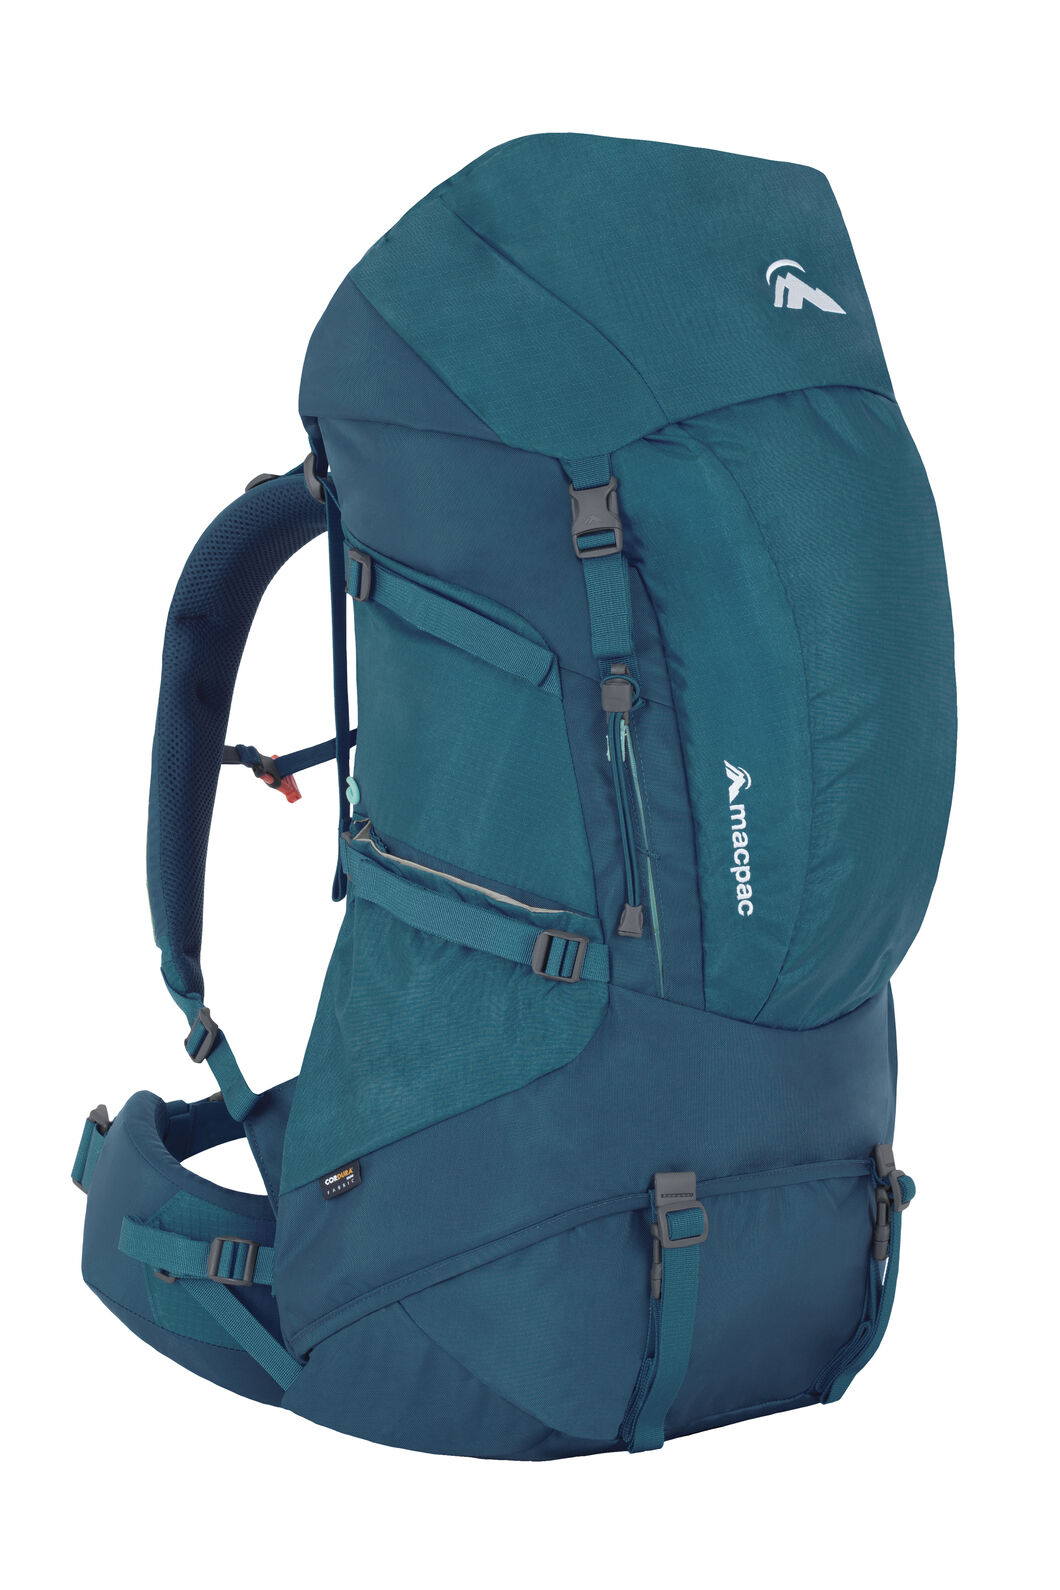 Macpac Torlesse 65L Pack V2, Ocean Depths, hi-res